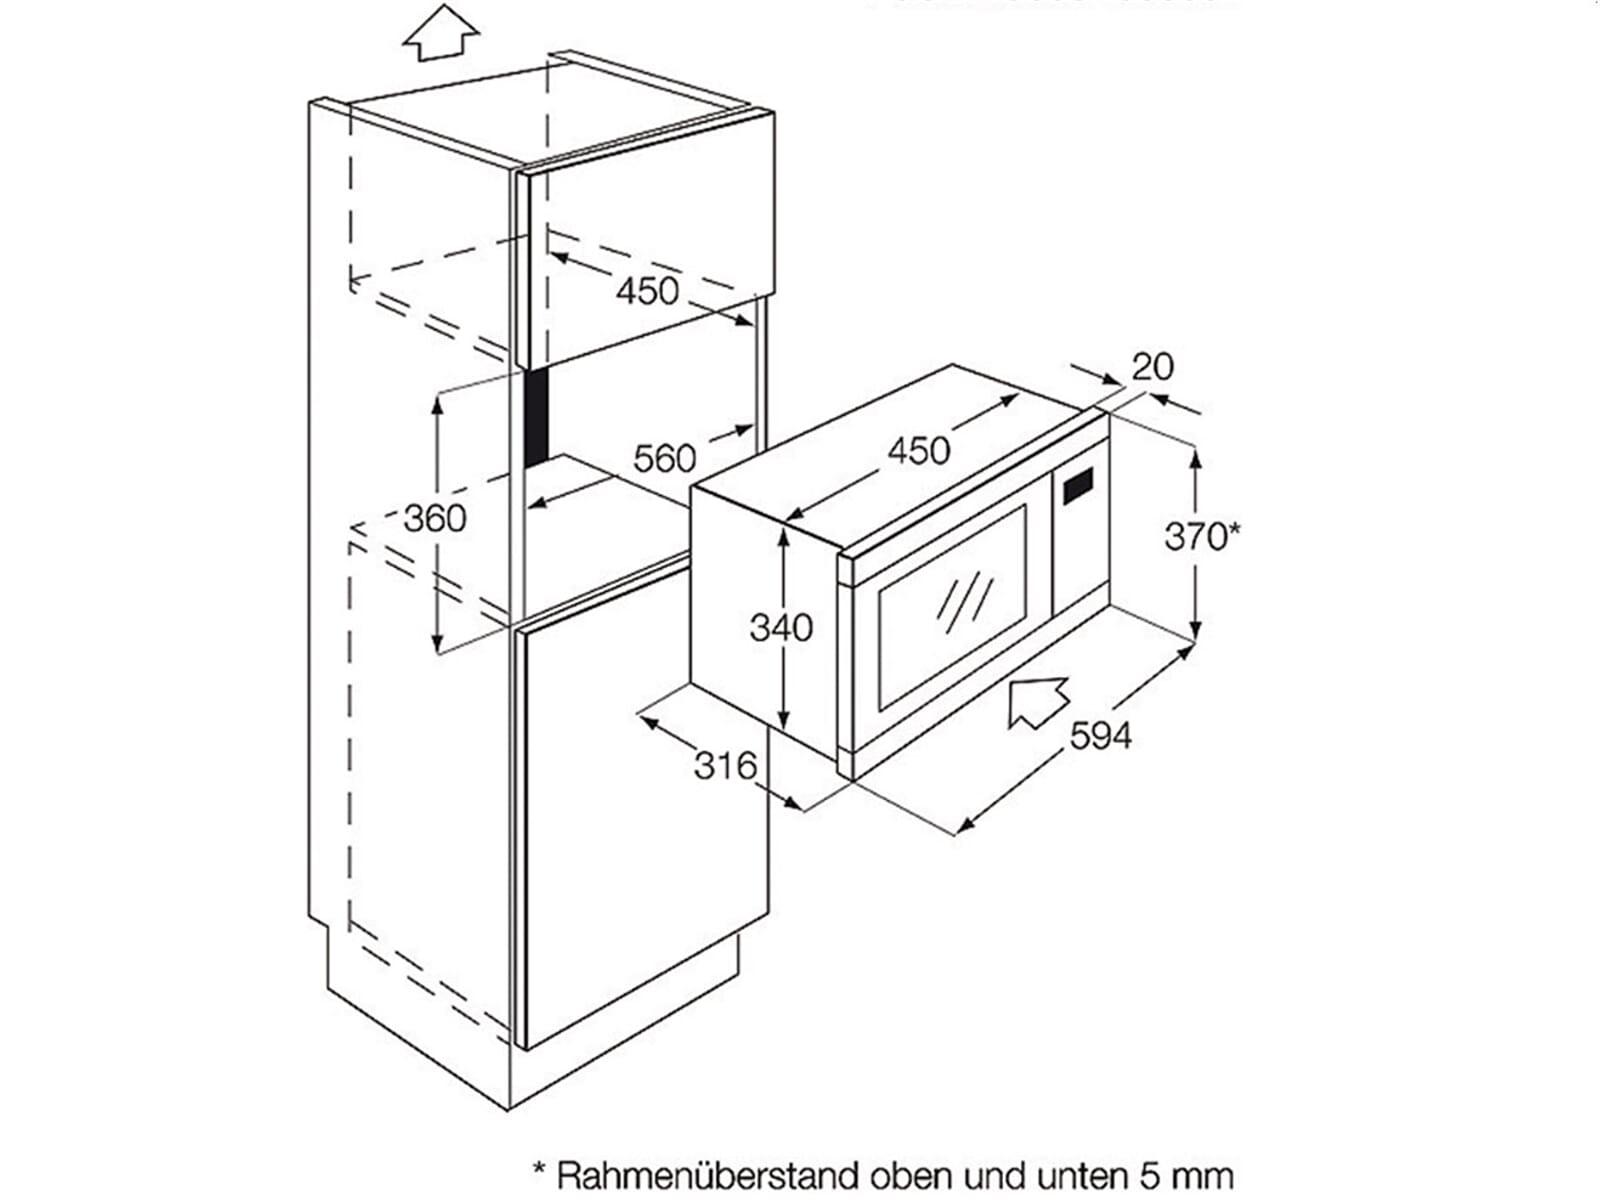 zanussi zbm17542xa einbau mikrowelle edelstahl. Black Bedroom Furniture Sets. Home Design Ideas